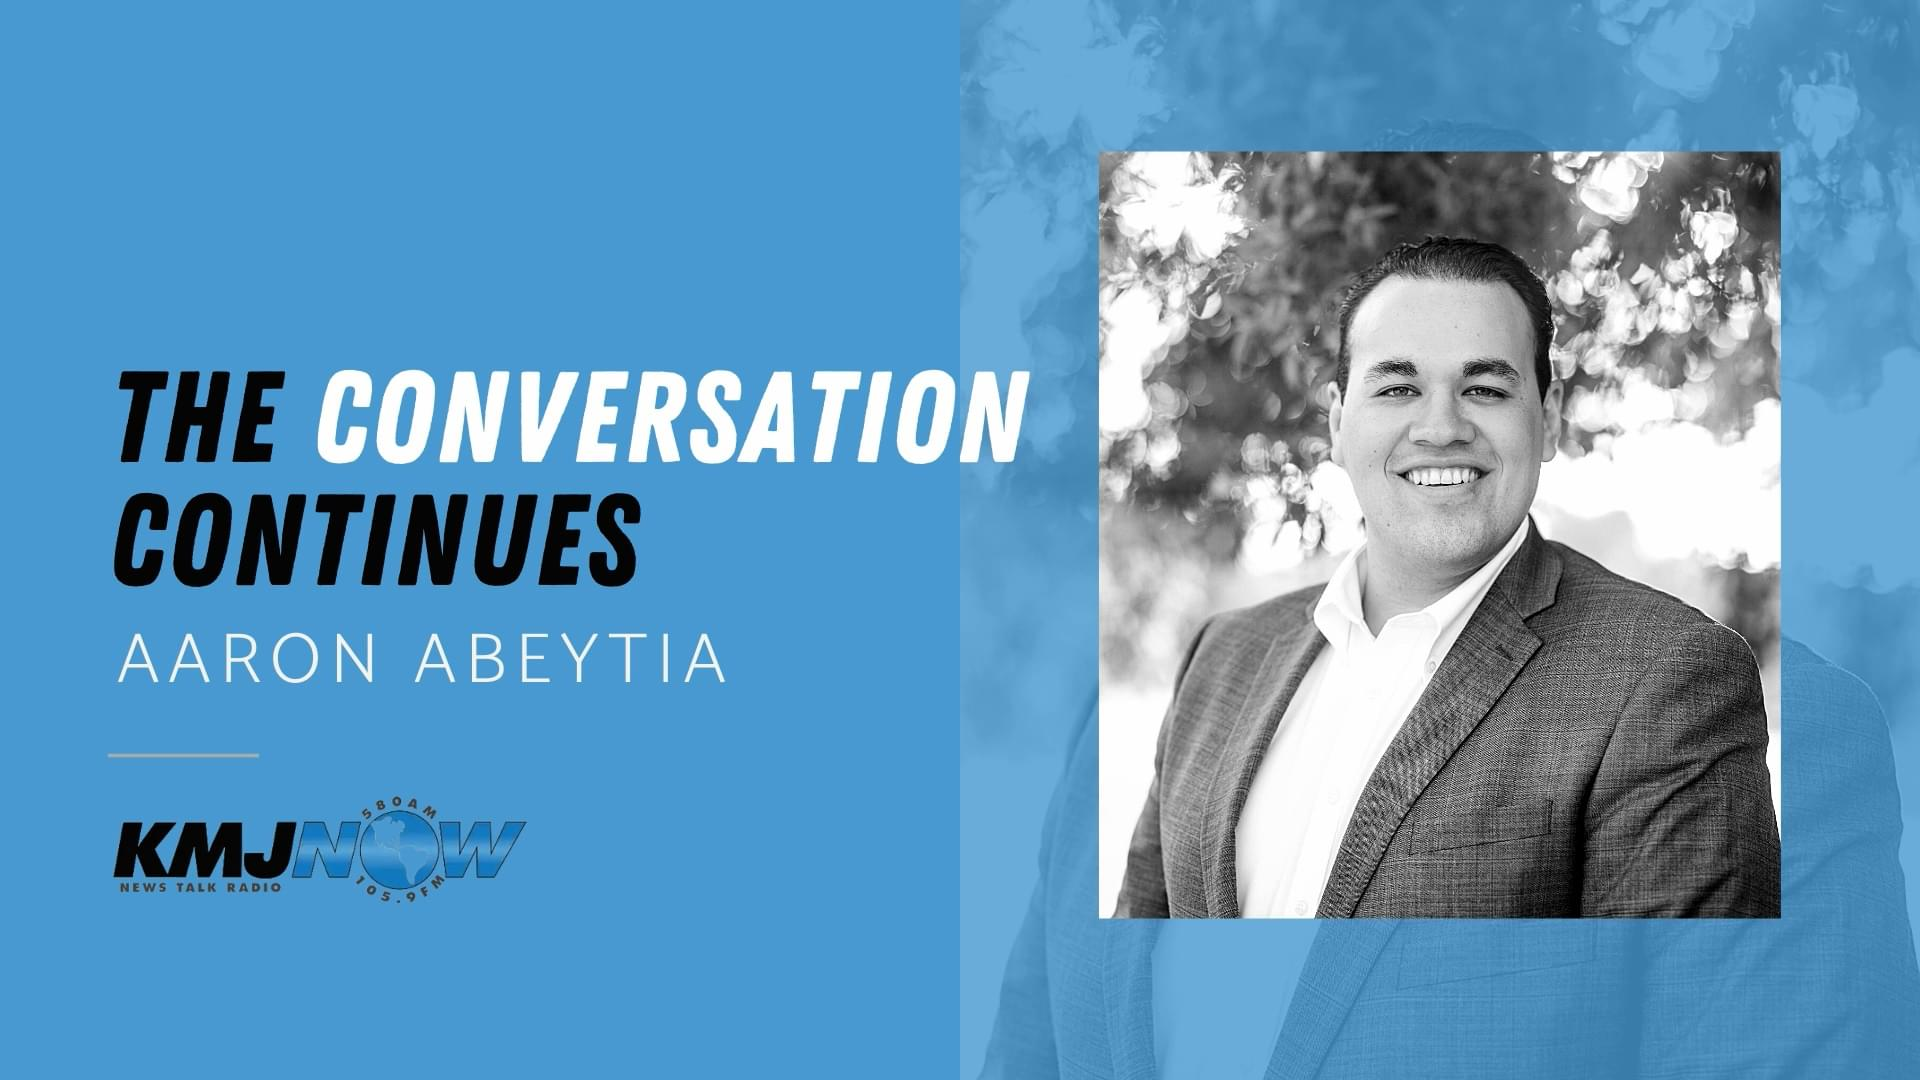 KMJ's Conversation Continues with Aaron Abeytia   Valentine's Eve 2.13.21